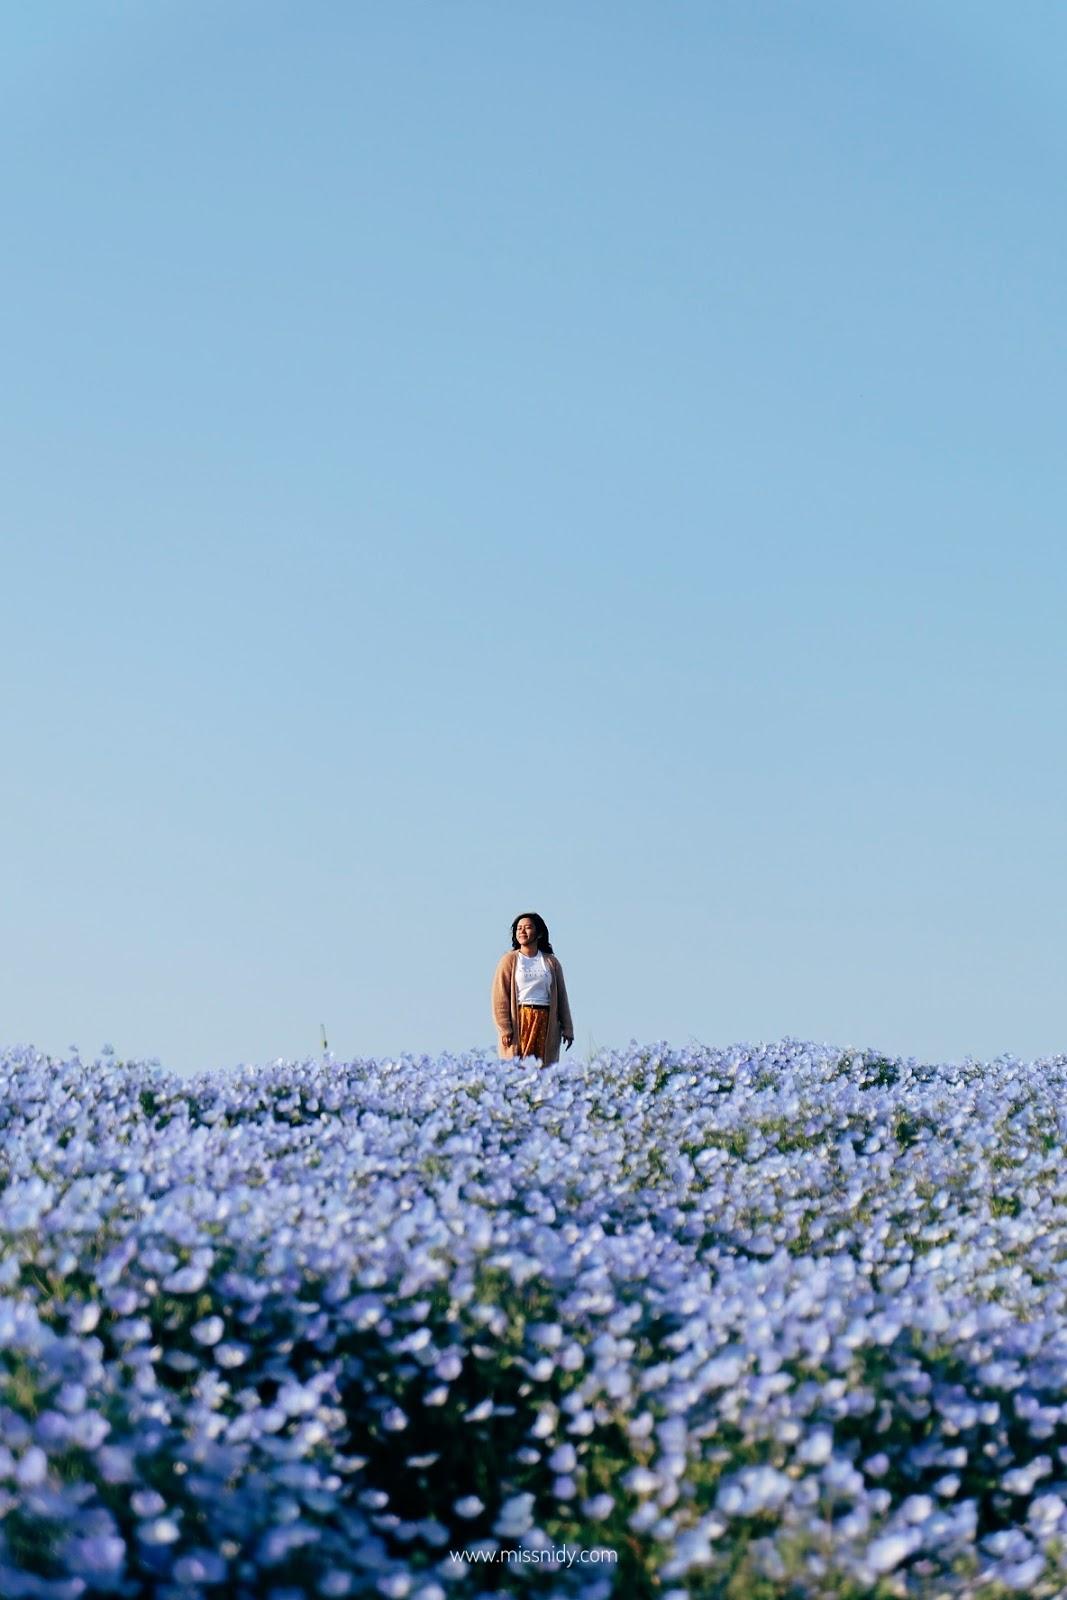 hamparan bunga biru di jepang